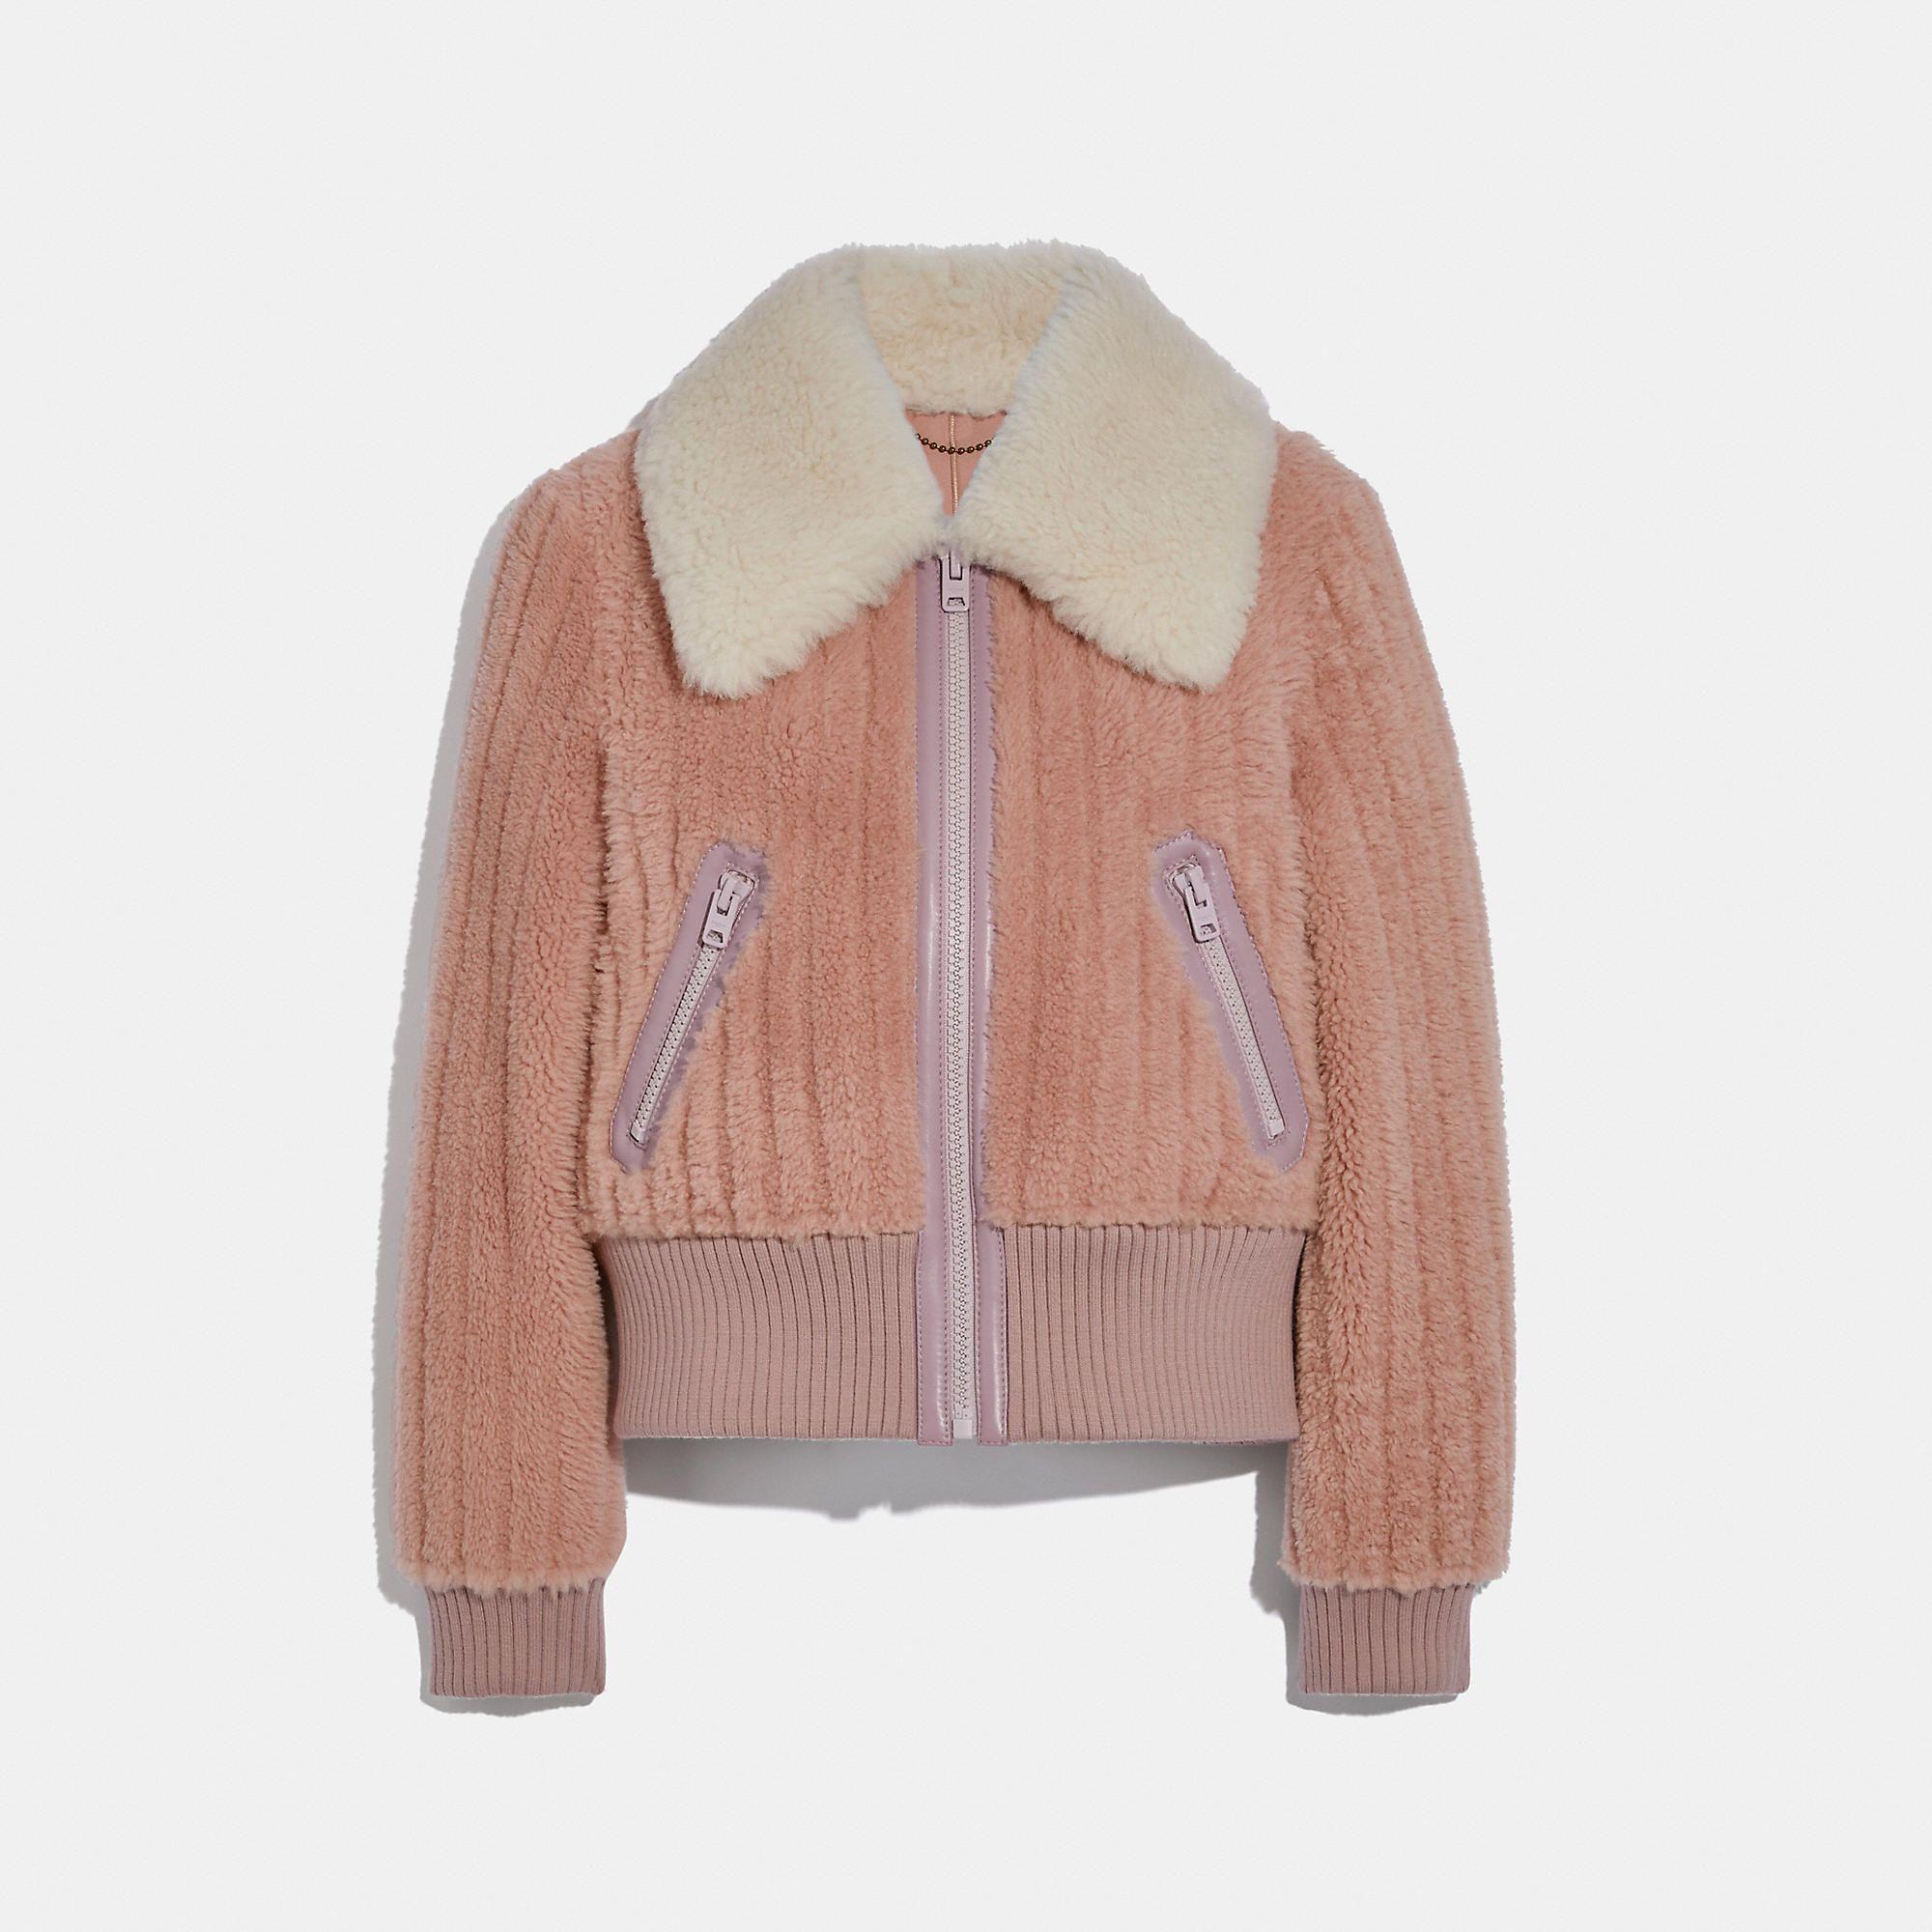 Women S Jackets Coats Outerwear Coach Jackets For Women Clothes Shop Womens Jackets [ 2000 x 2000 Pixel ]